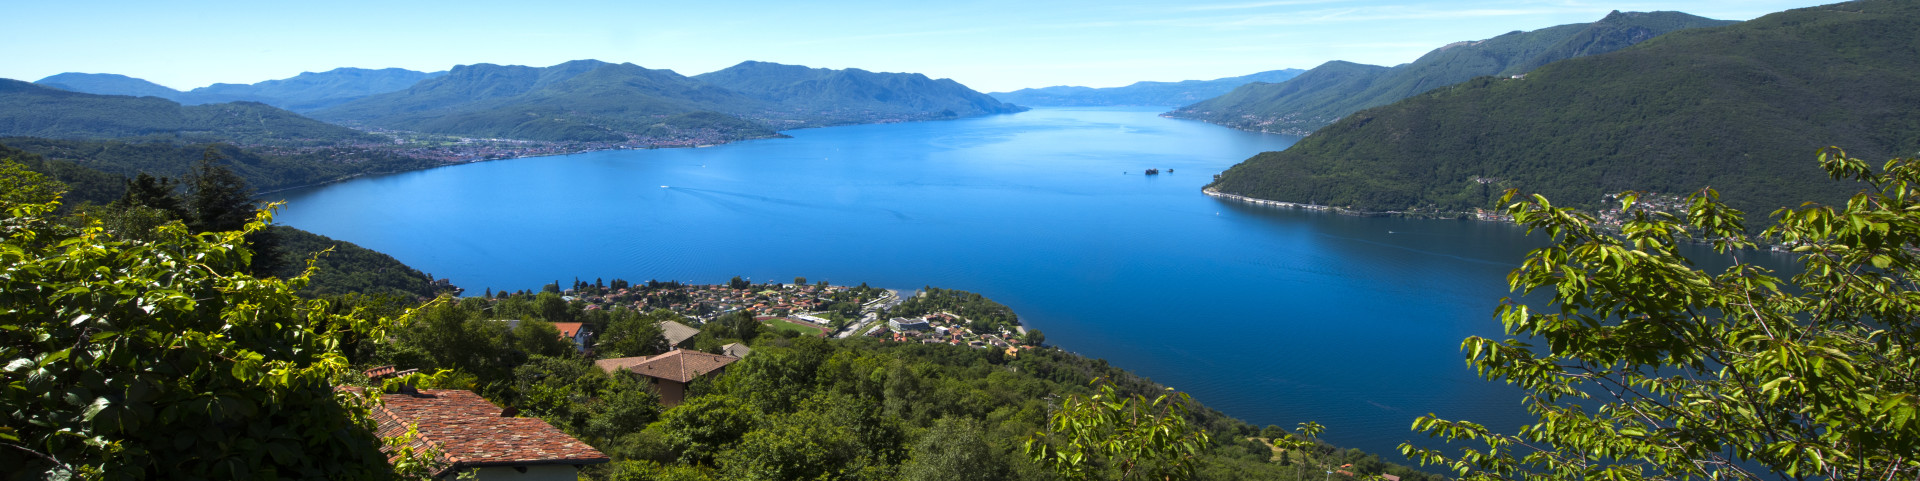 Lago Maggiore - pohled na jezero přes městečko Maccagno